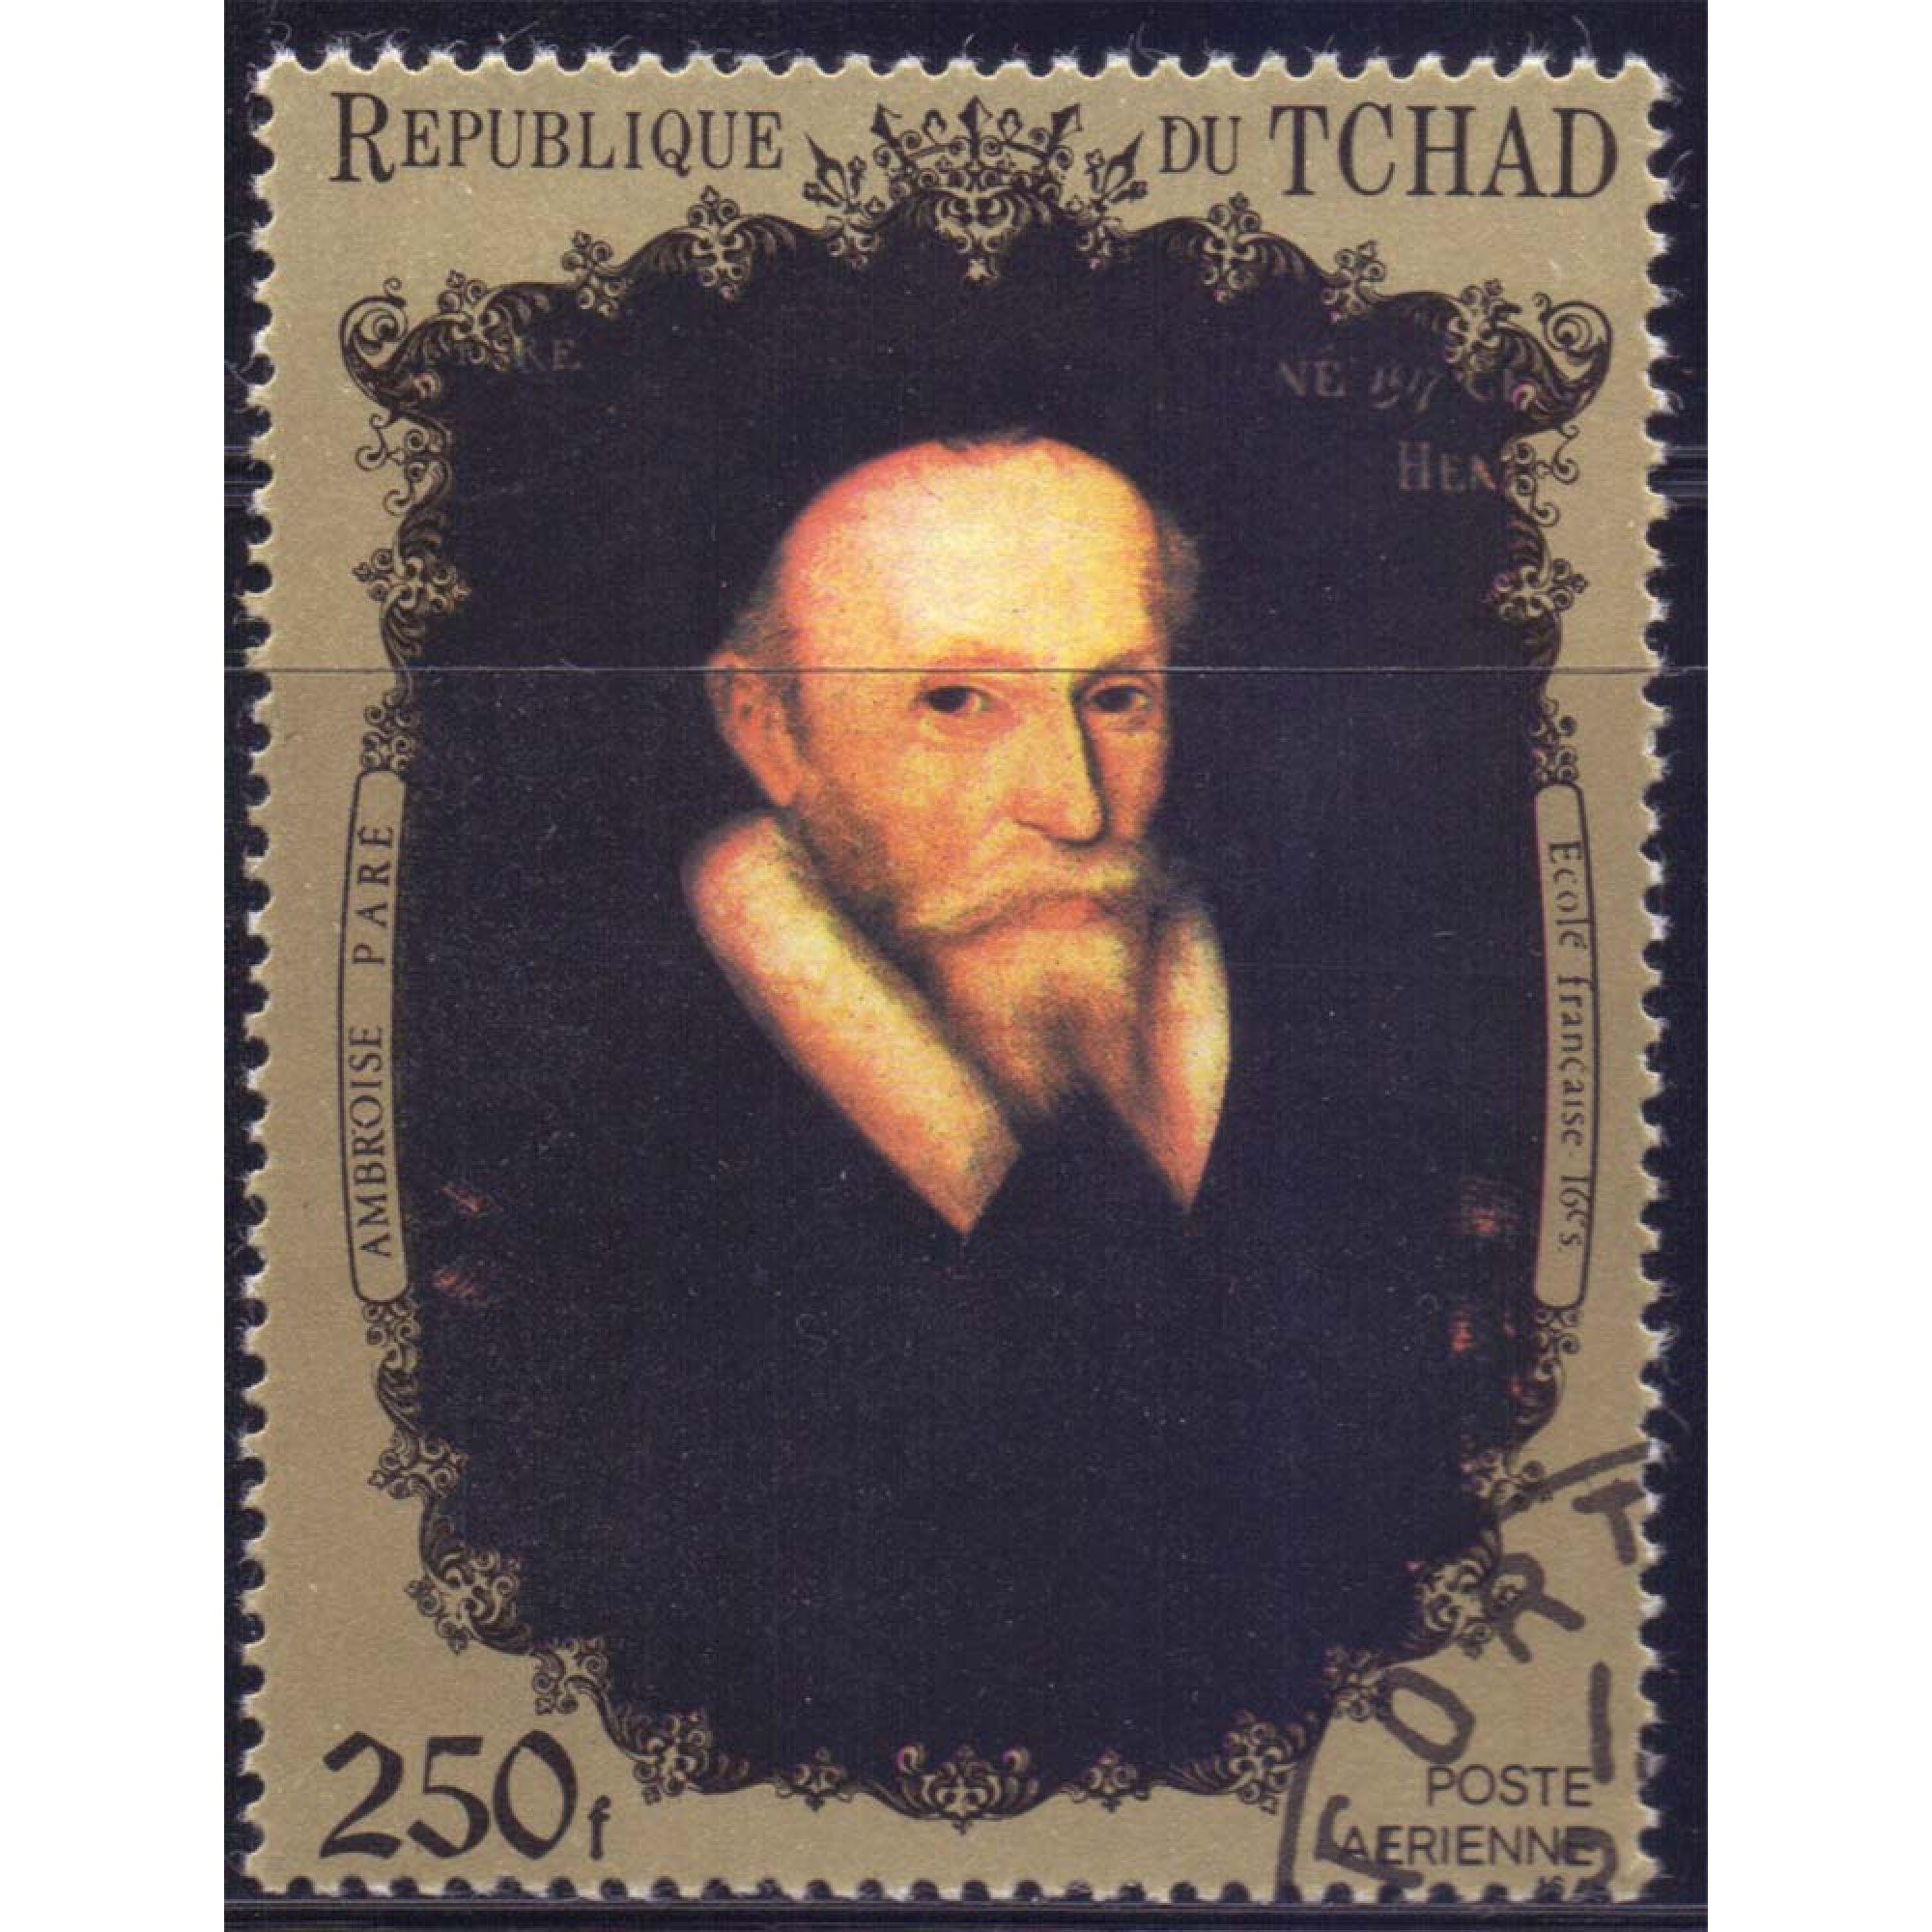 Французская почтовая марка